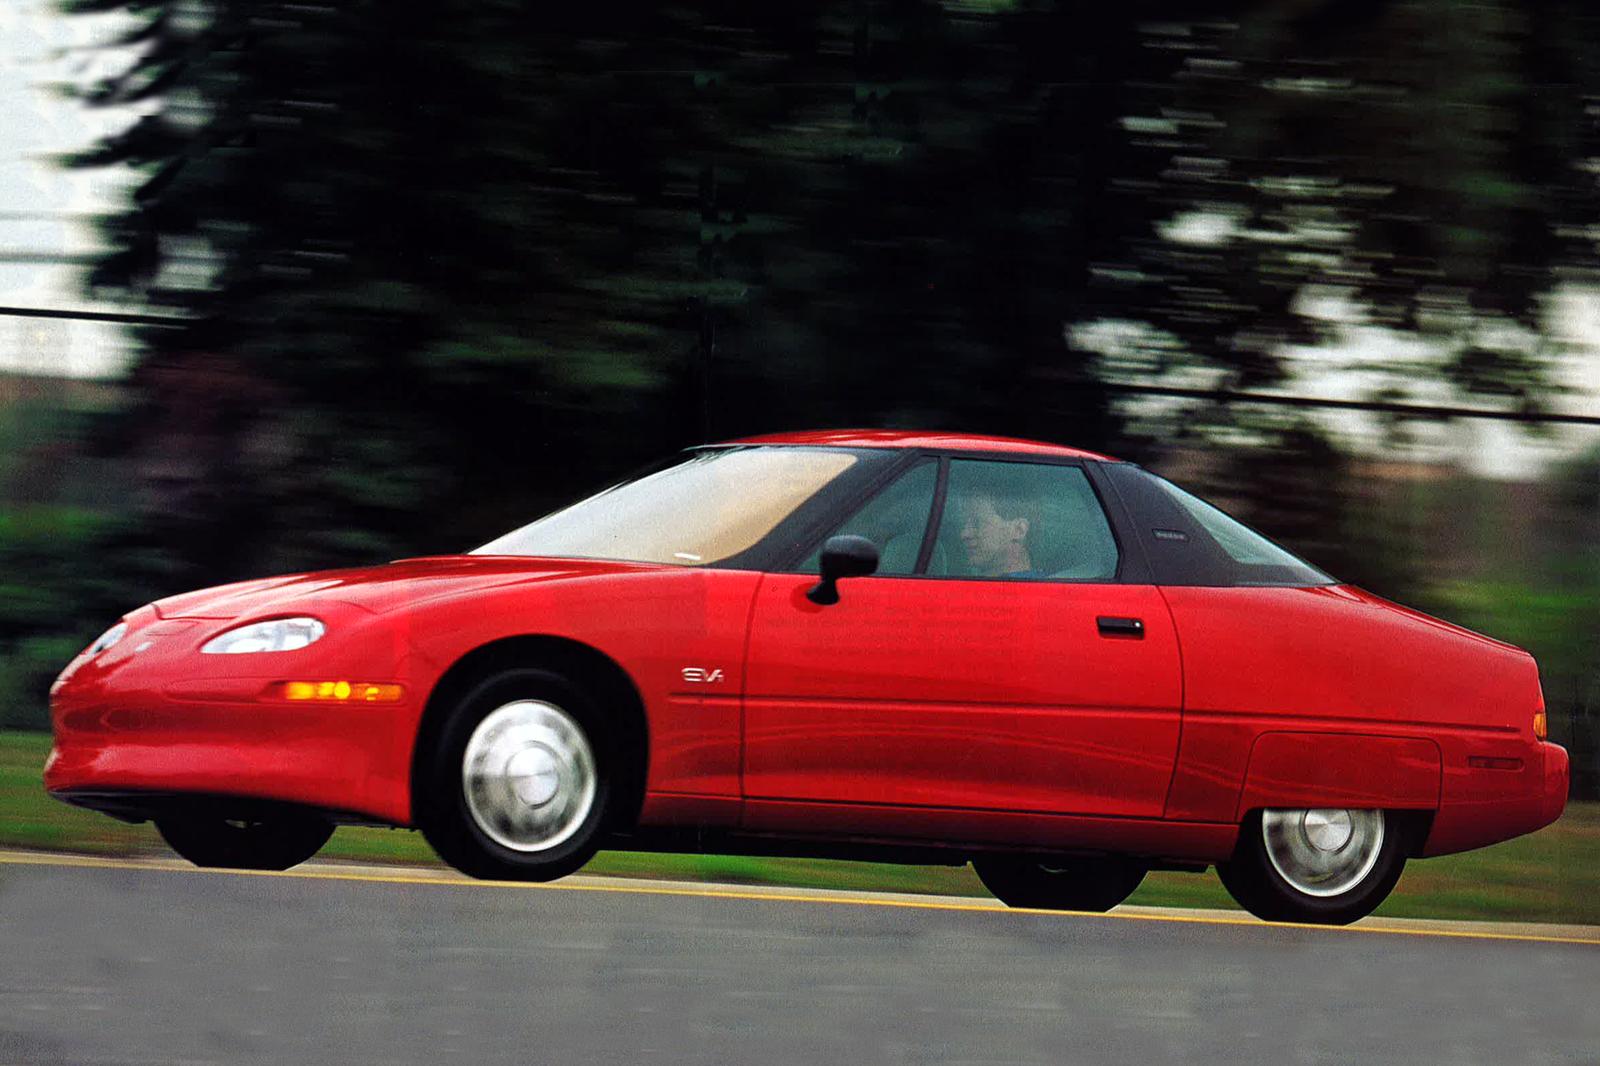 Throwback Thursday: 1996 General Motors EV1 first drive | Autocar